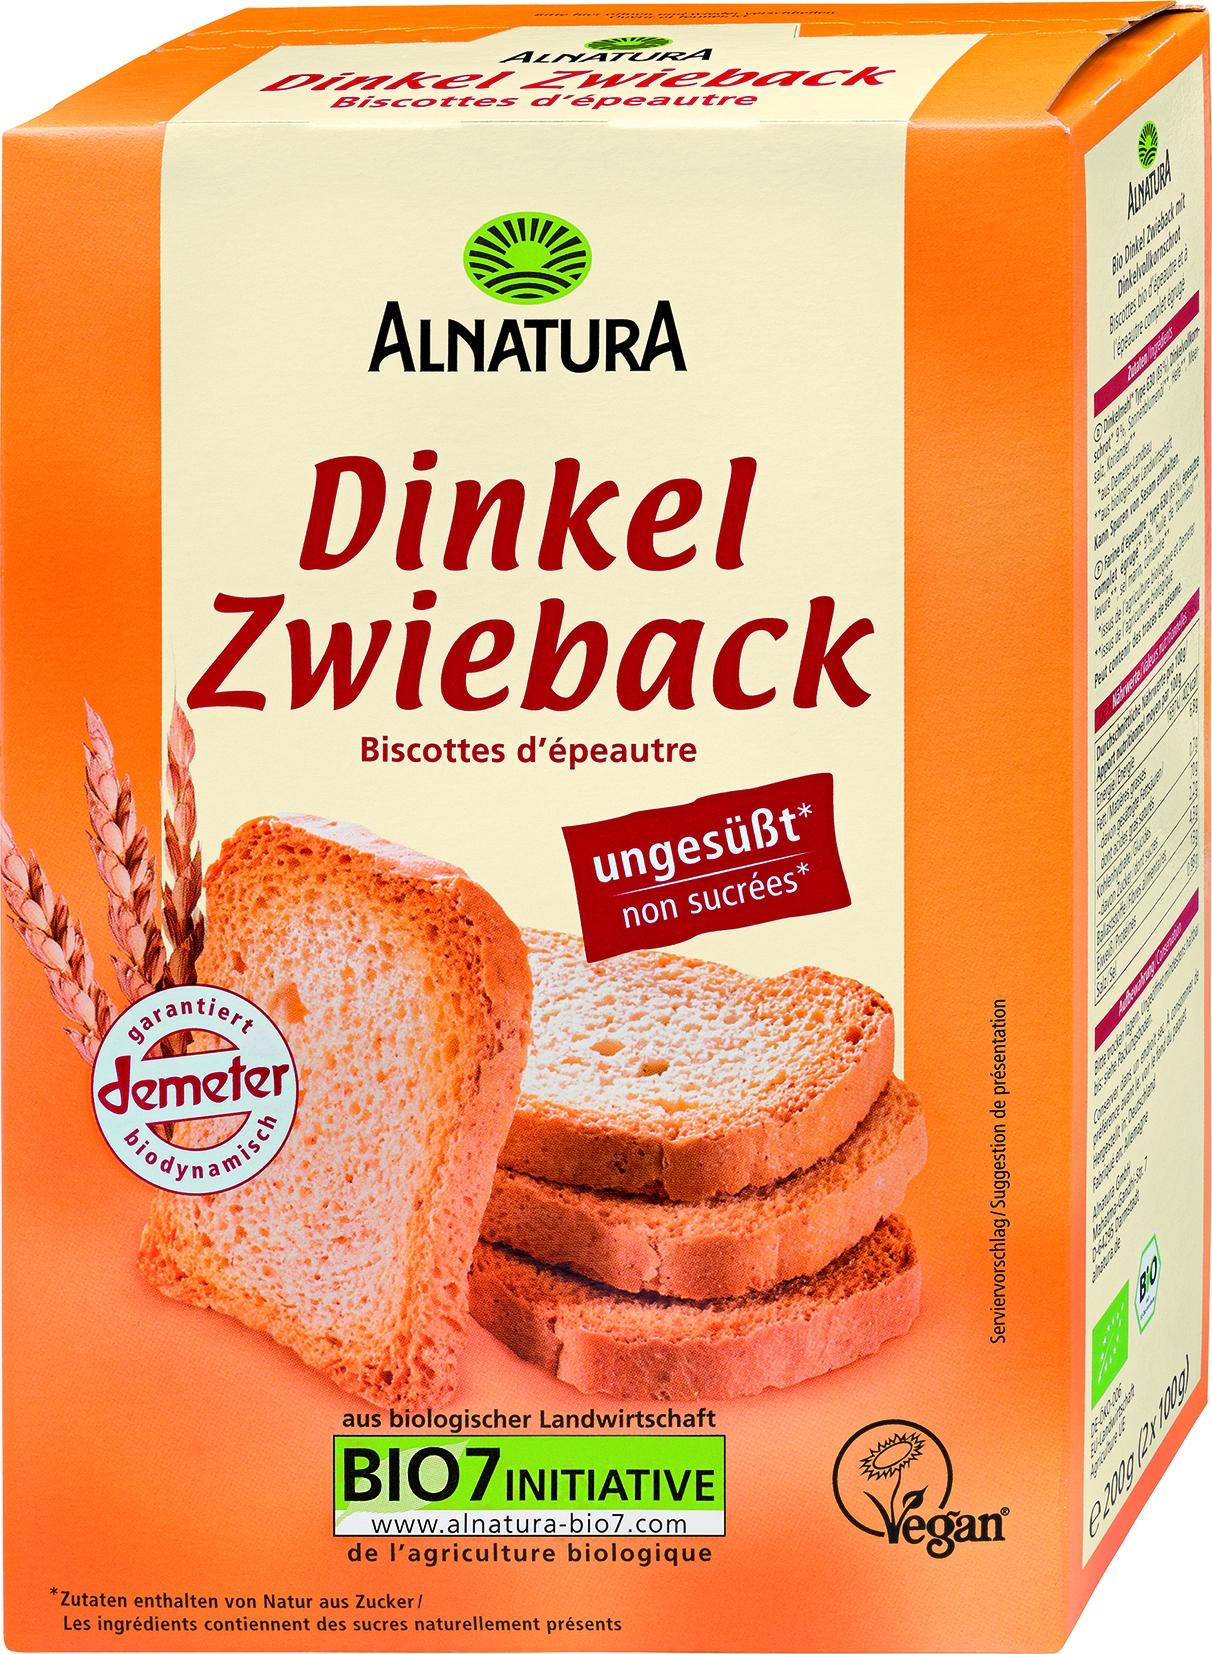 Dinkel Zwieback